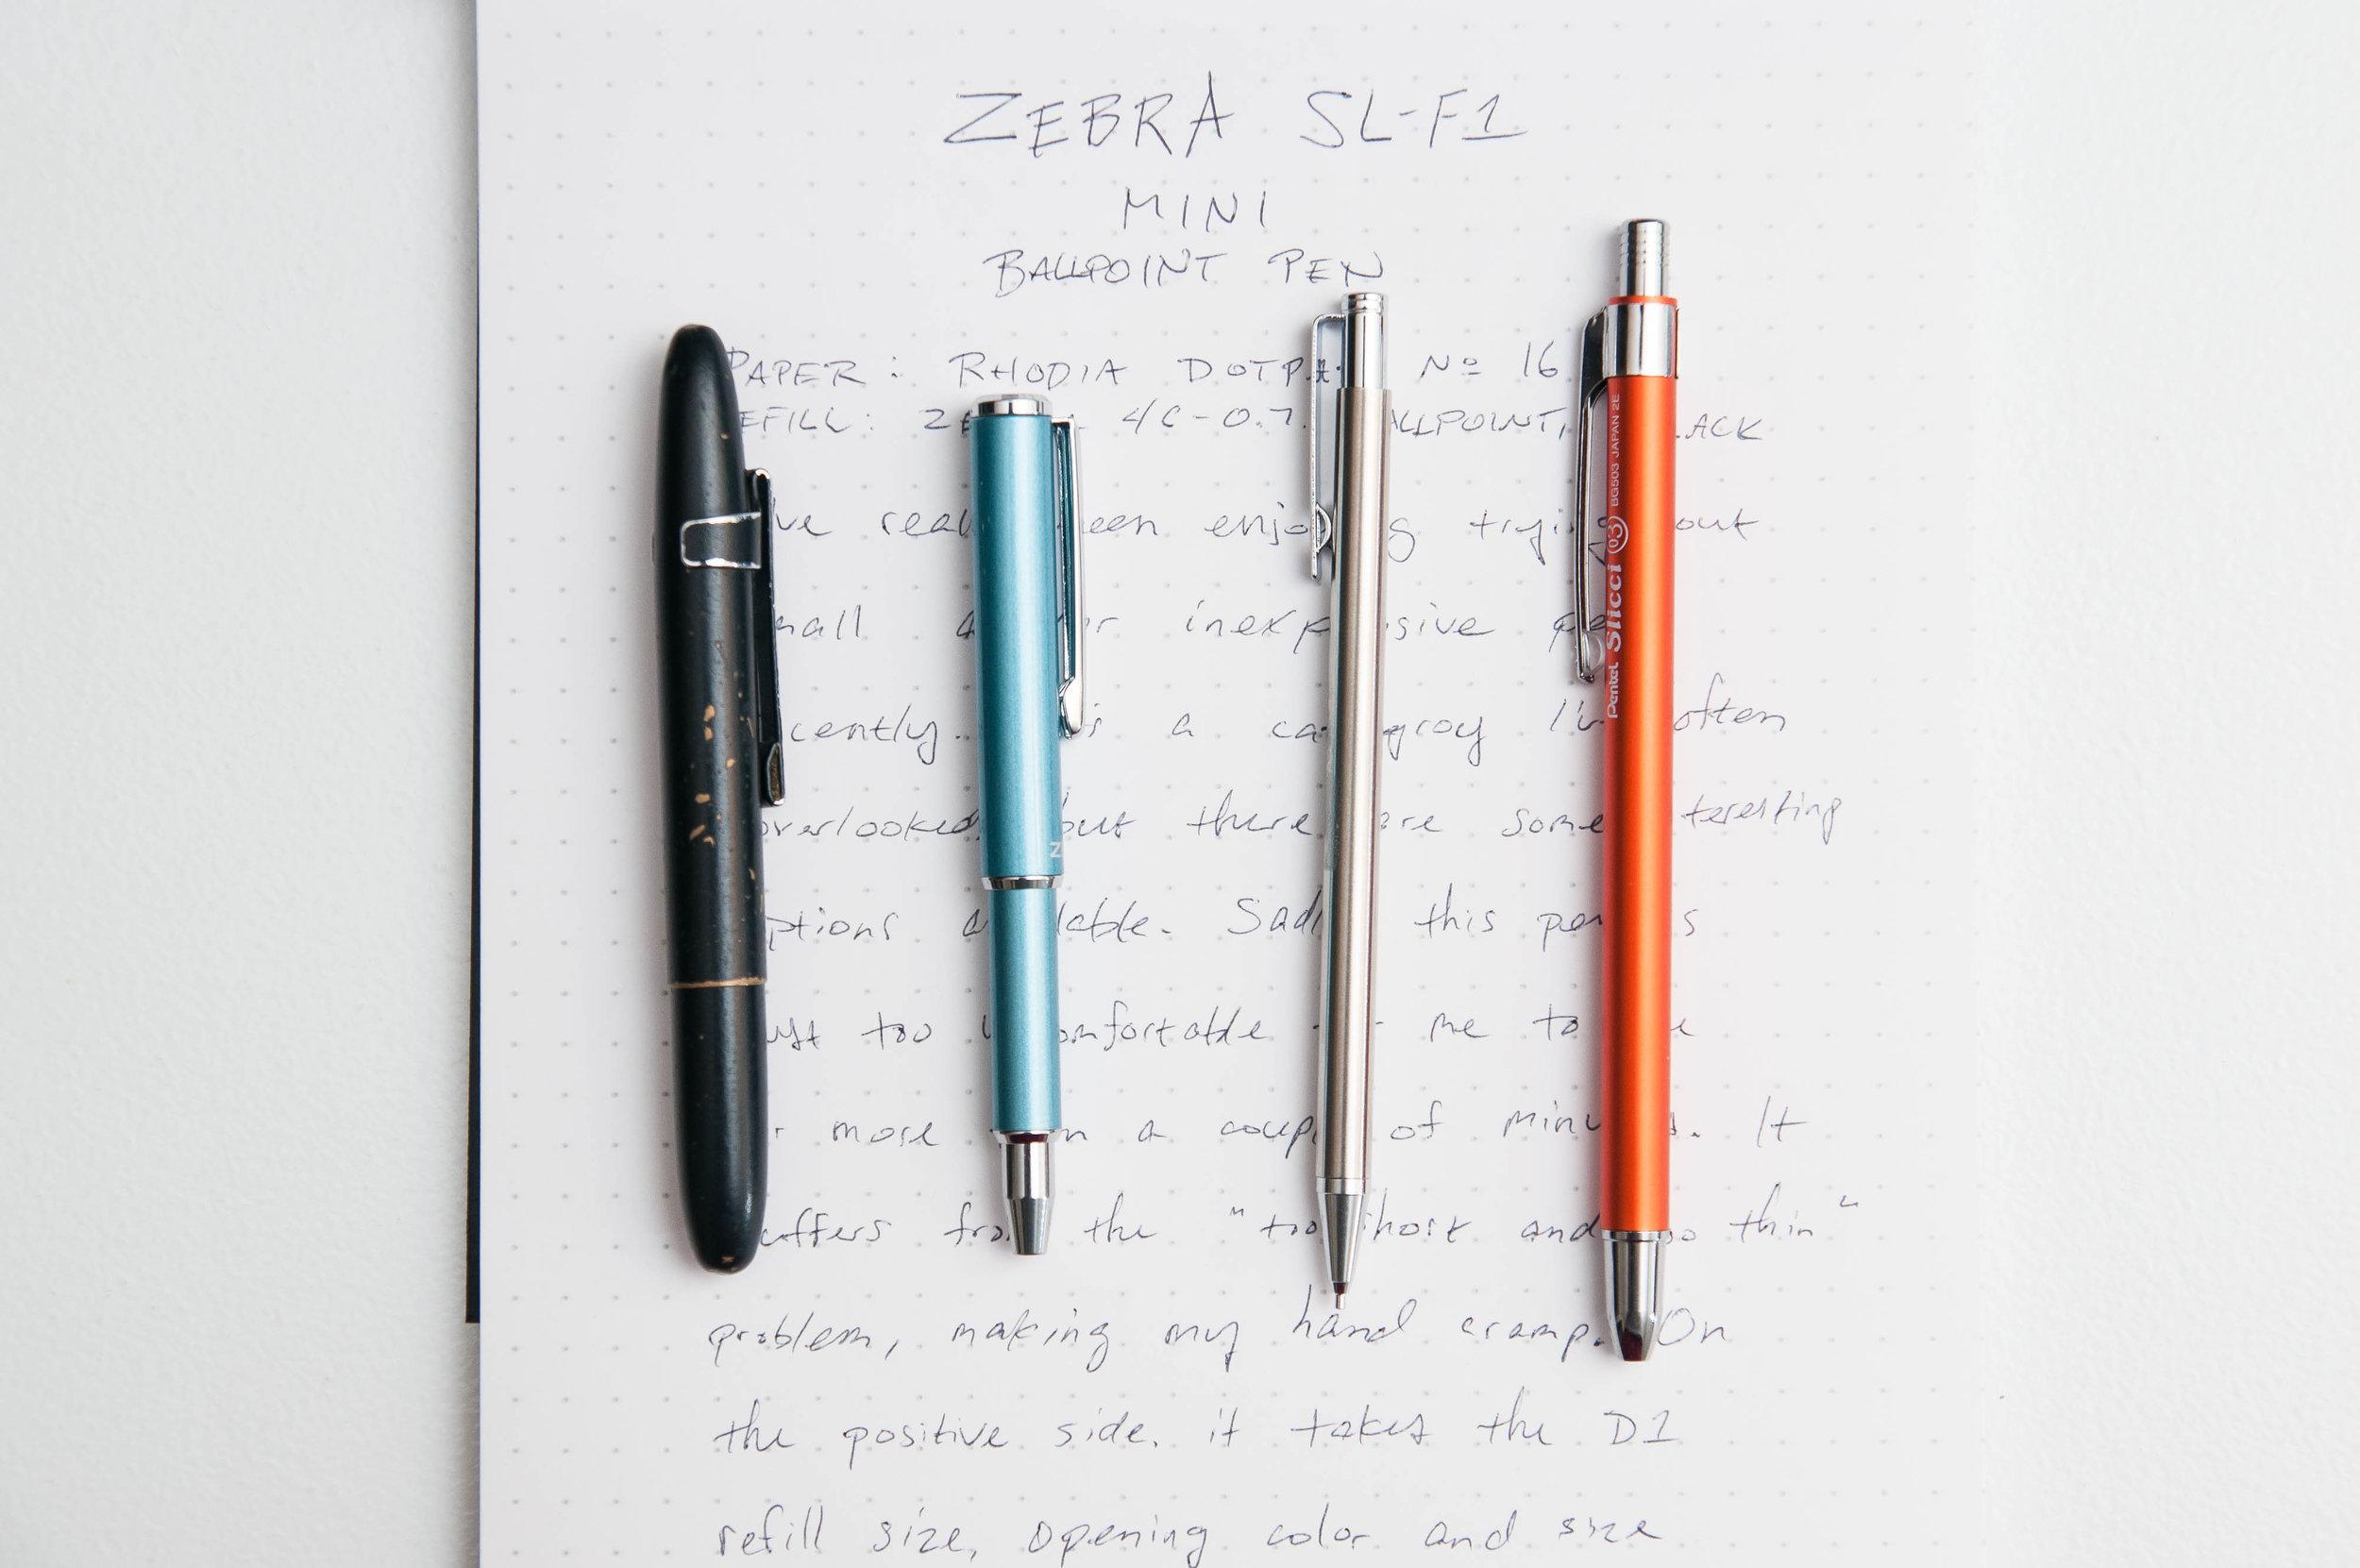 Zebra SL-F1 Mini Ballpoint Pen Comparison